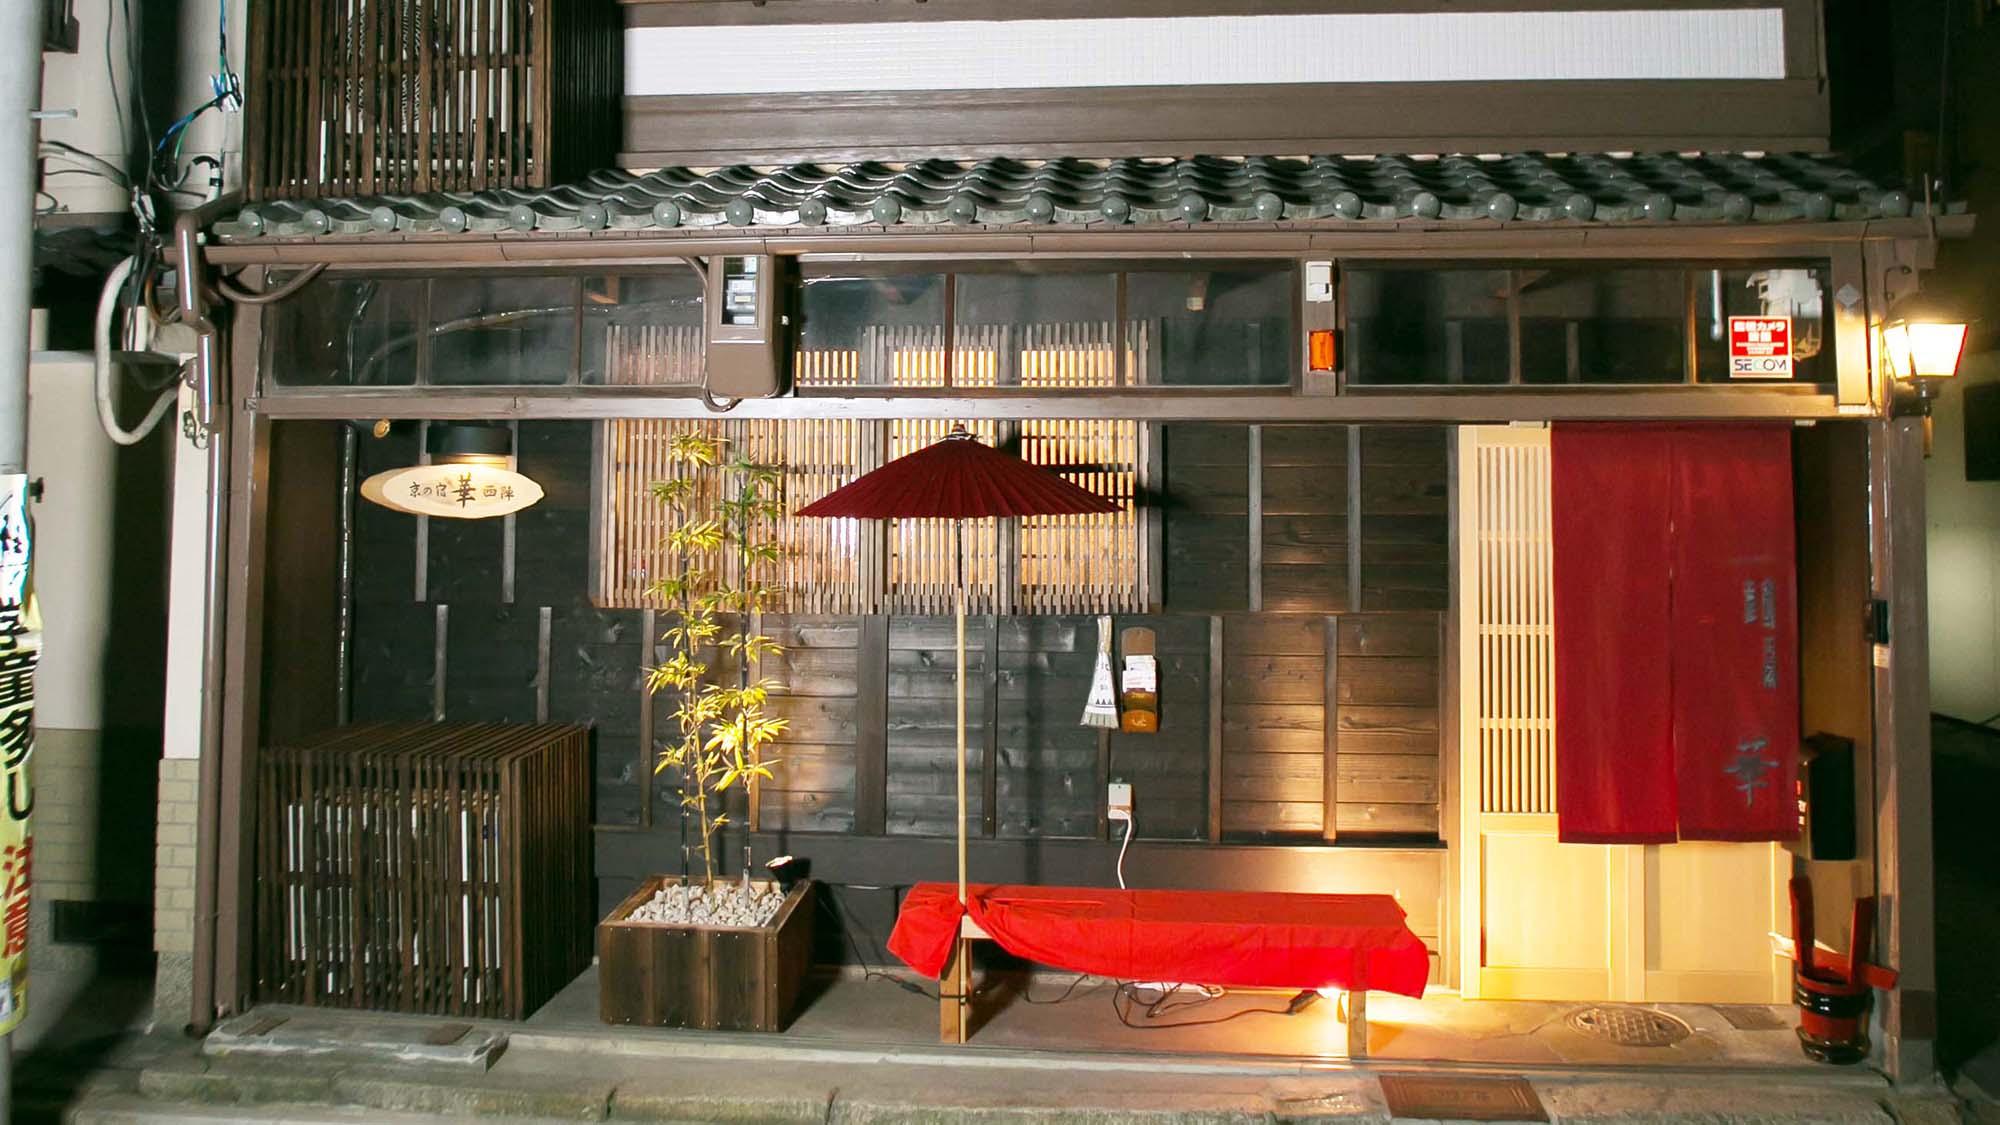 京の宿華西陣